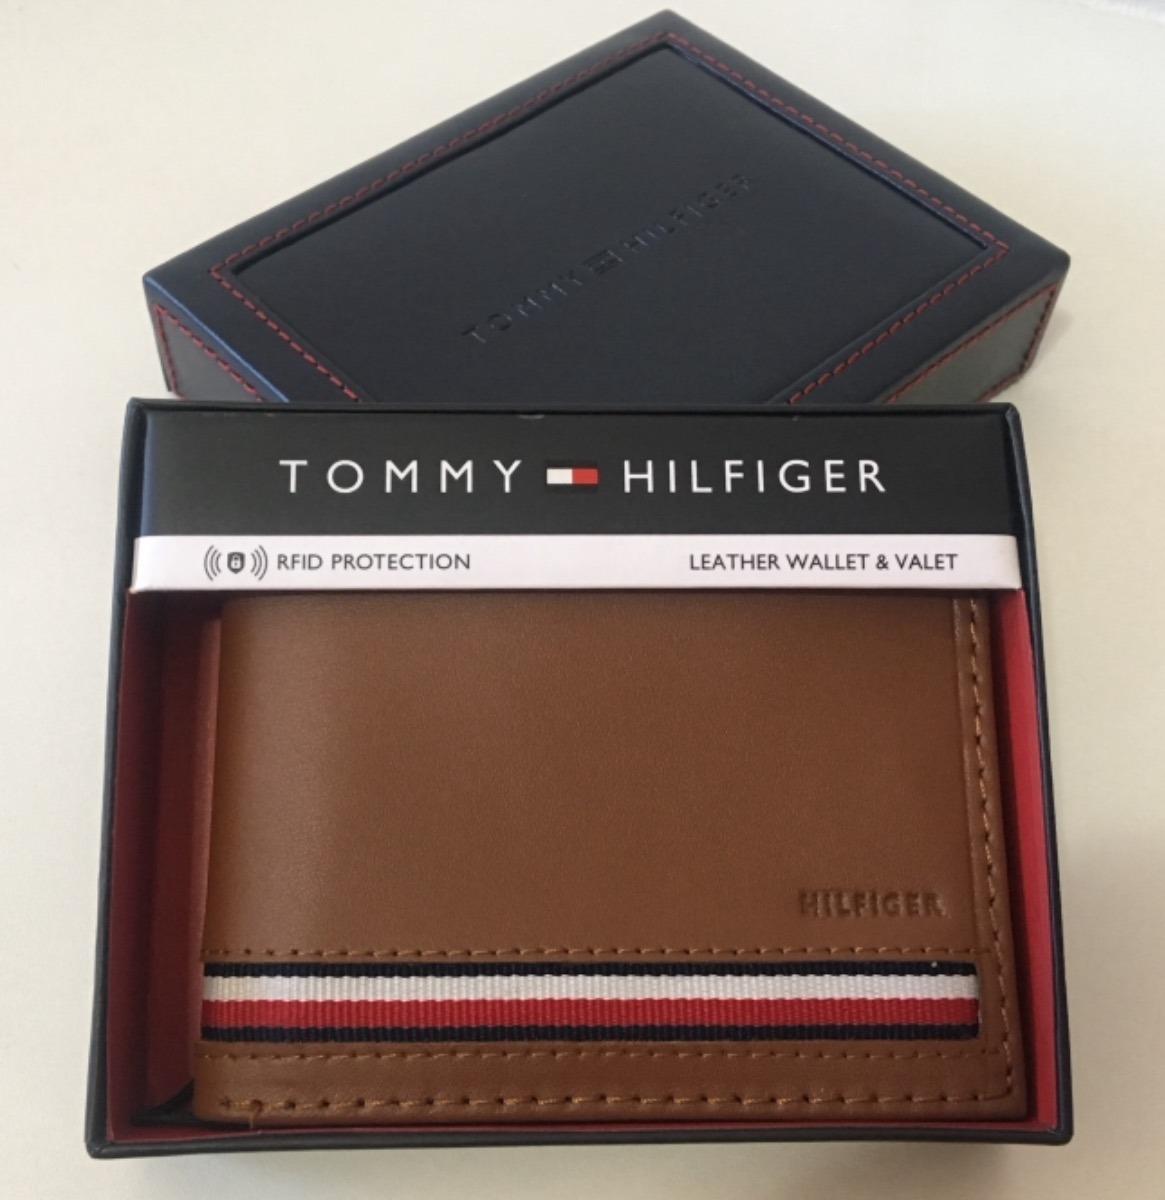 0d55d7bf0e Carteira Masculina Tommy Hilfiger Caramelo - Cod 245 - R$ 169,00 em ...